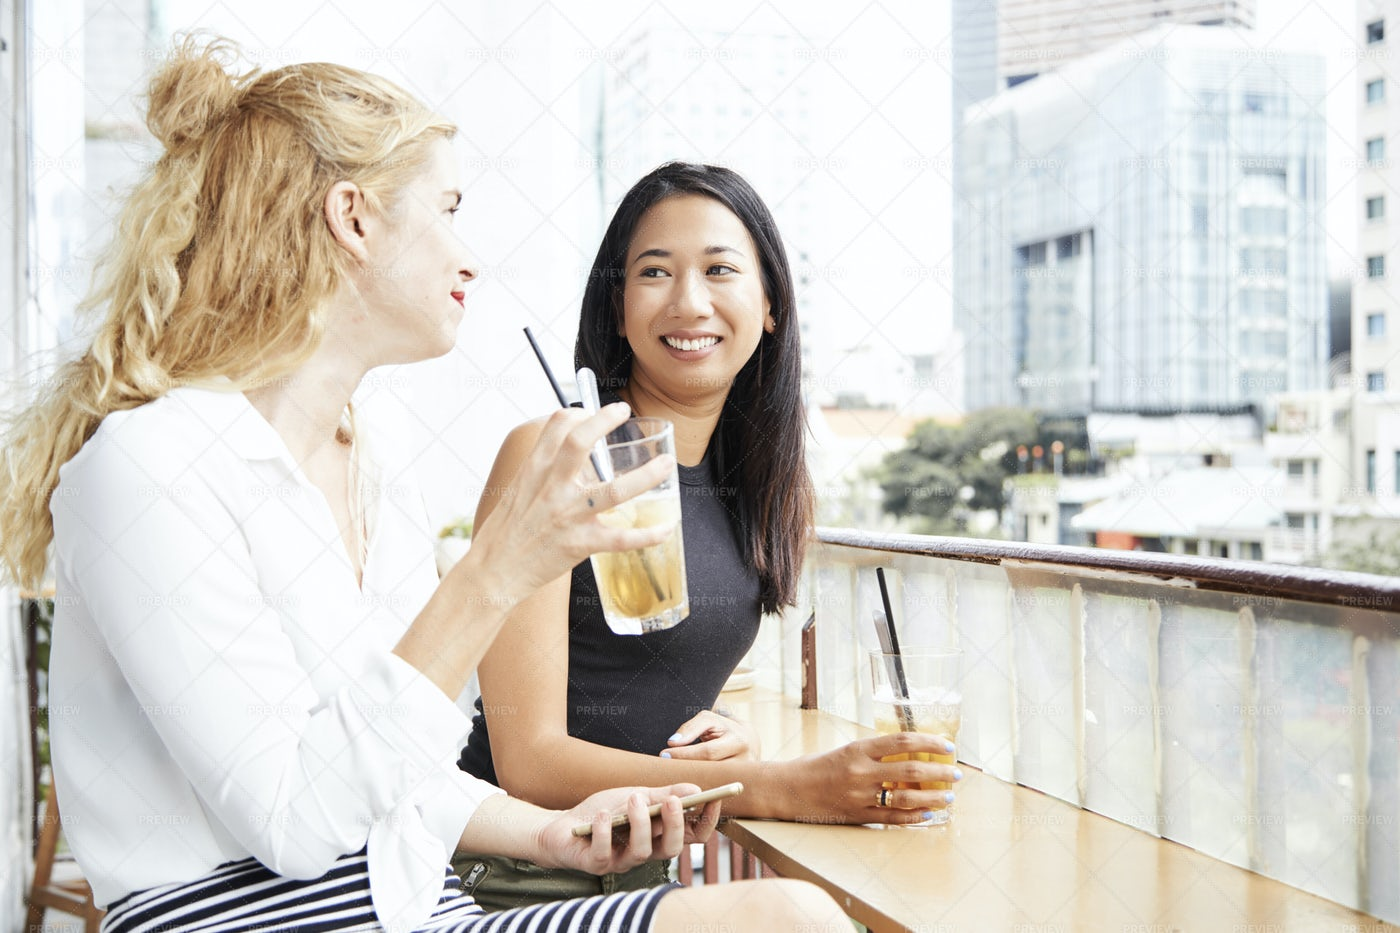 Gossiping Friends: Stock Photos